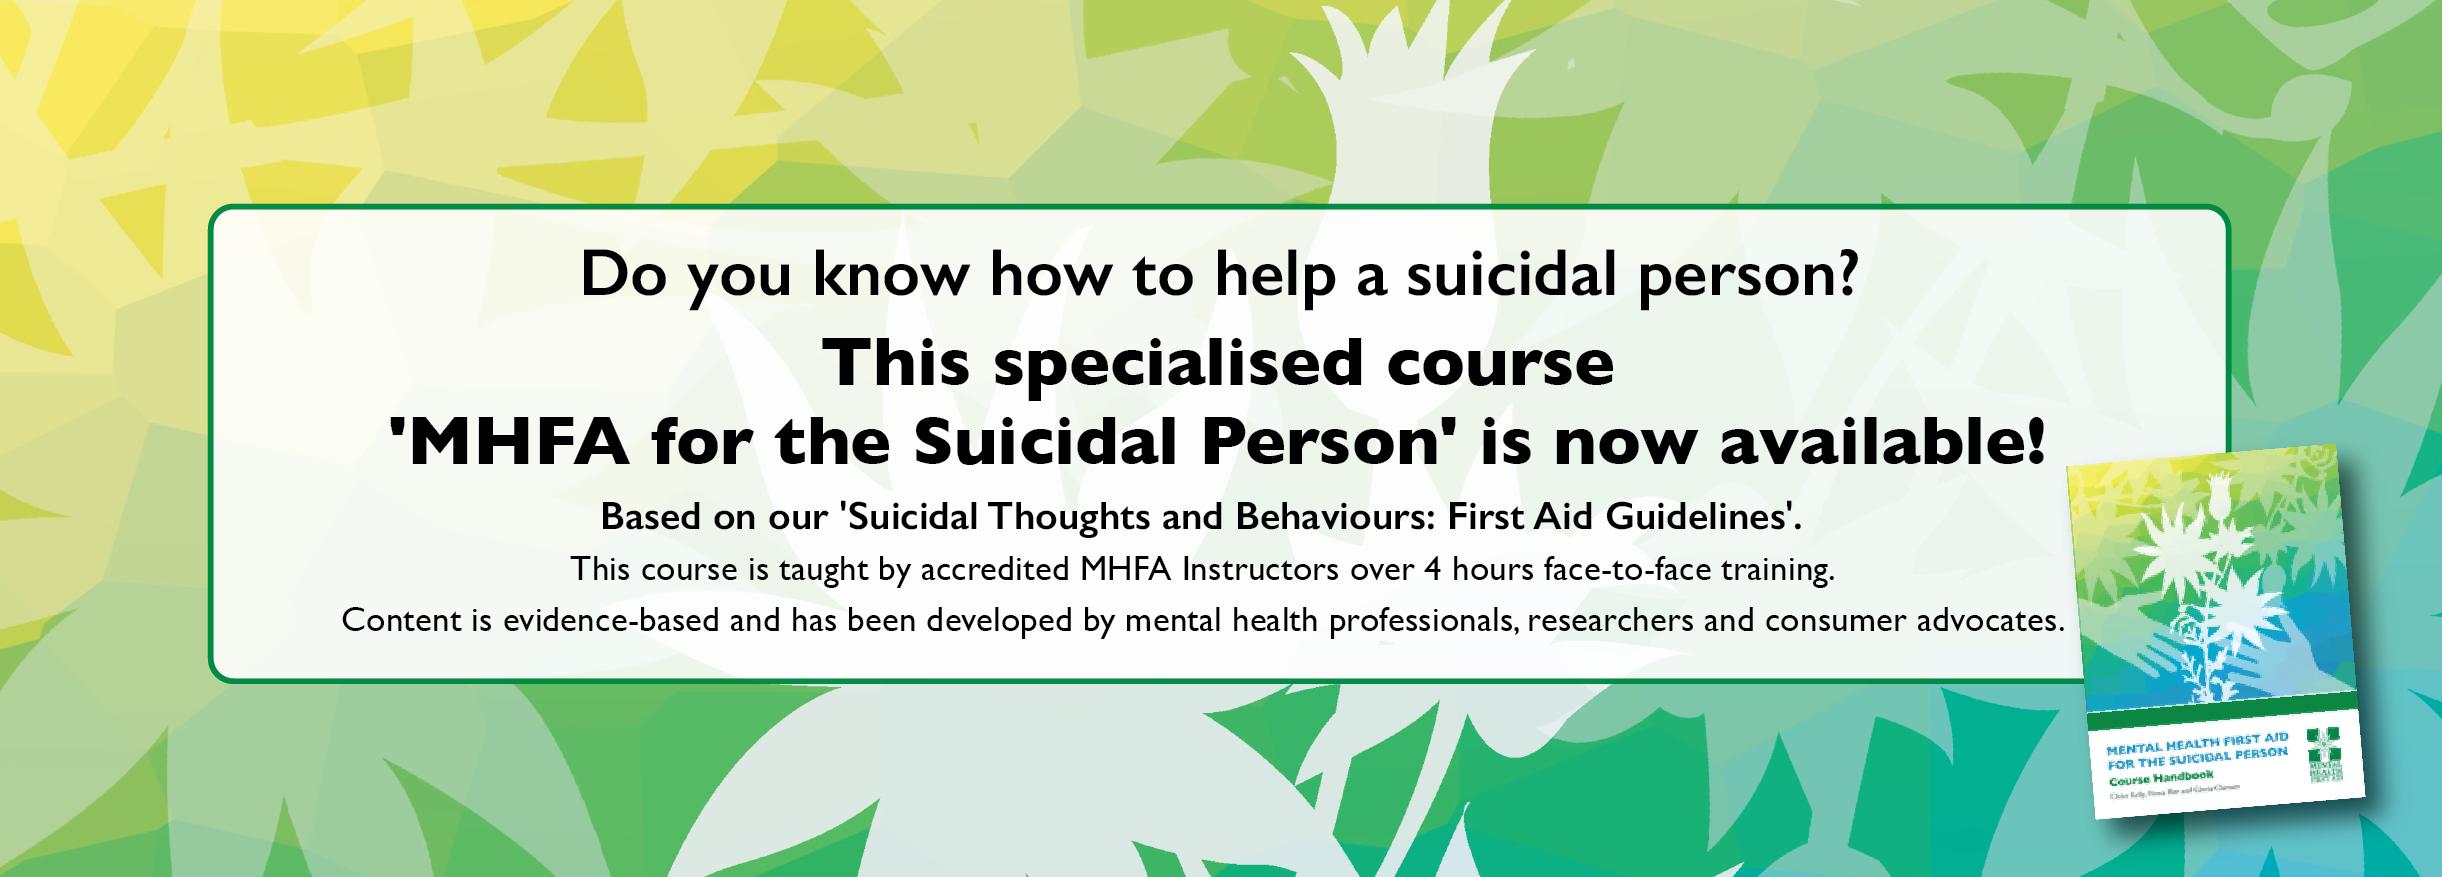 Suicide Course Banner